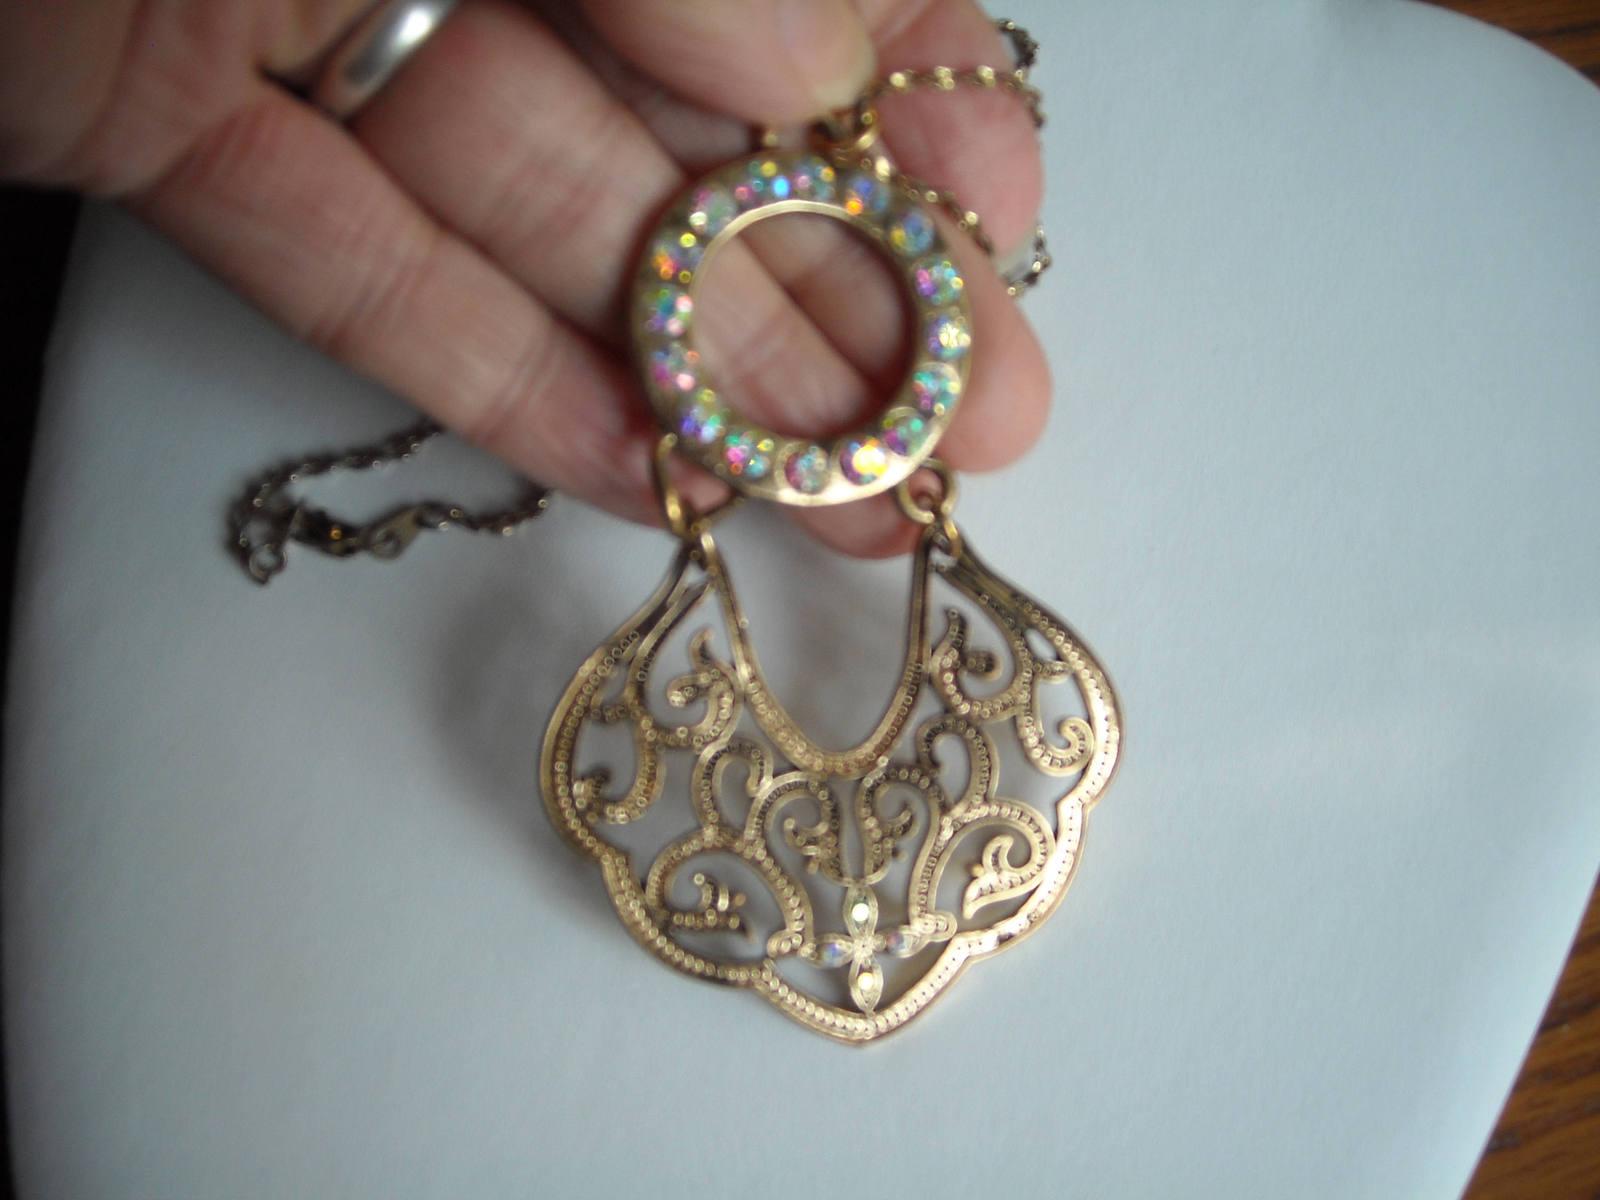 Necklace Gold Tone Filigree Metal & Aurora Borealis Rhinestones Gold Tone Chain